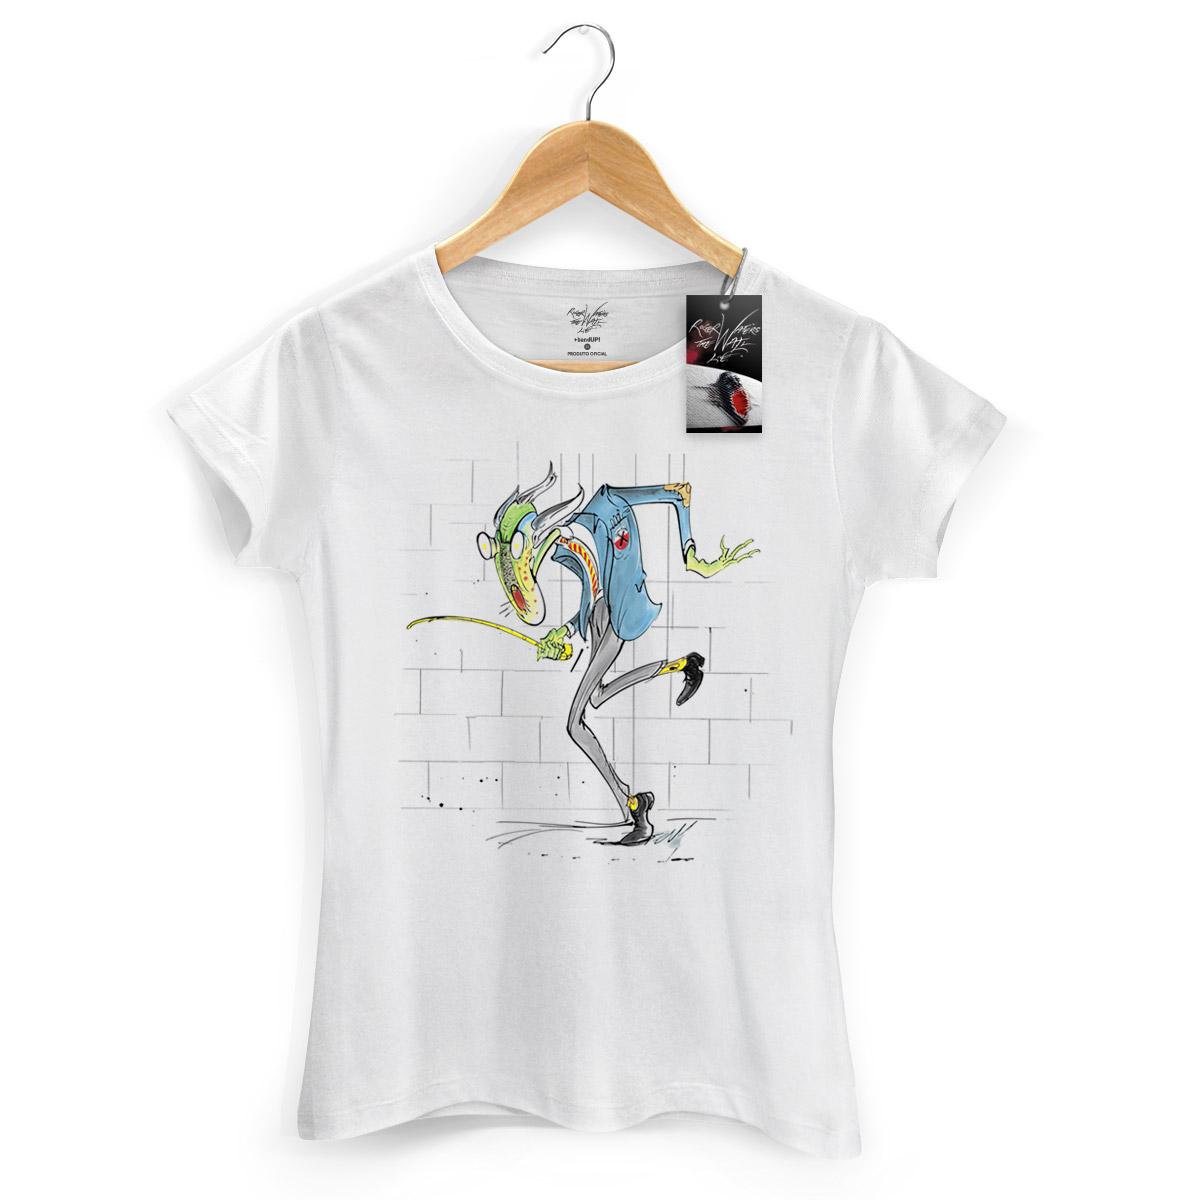 Camiseta Feminina Roger Waters Professor